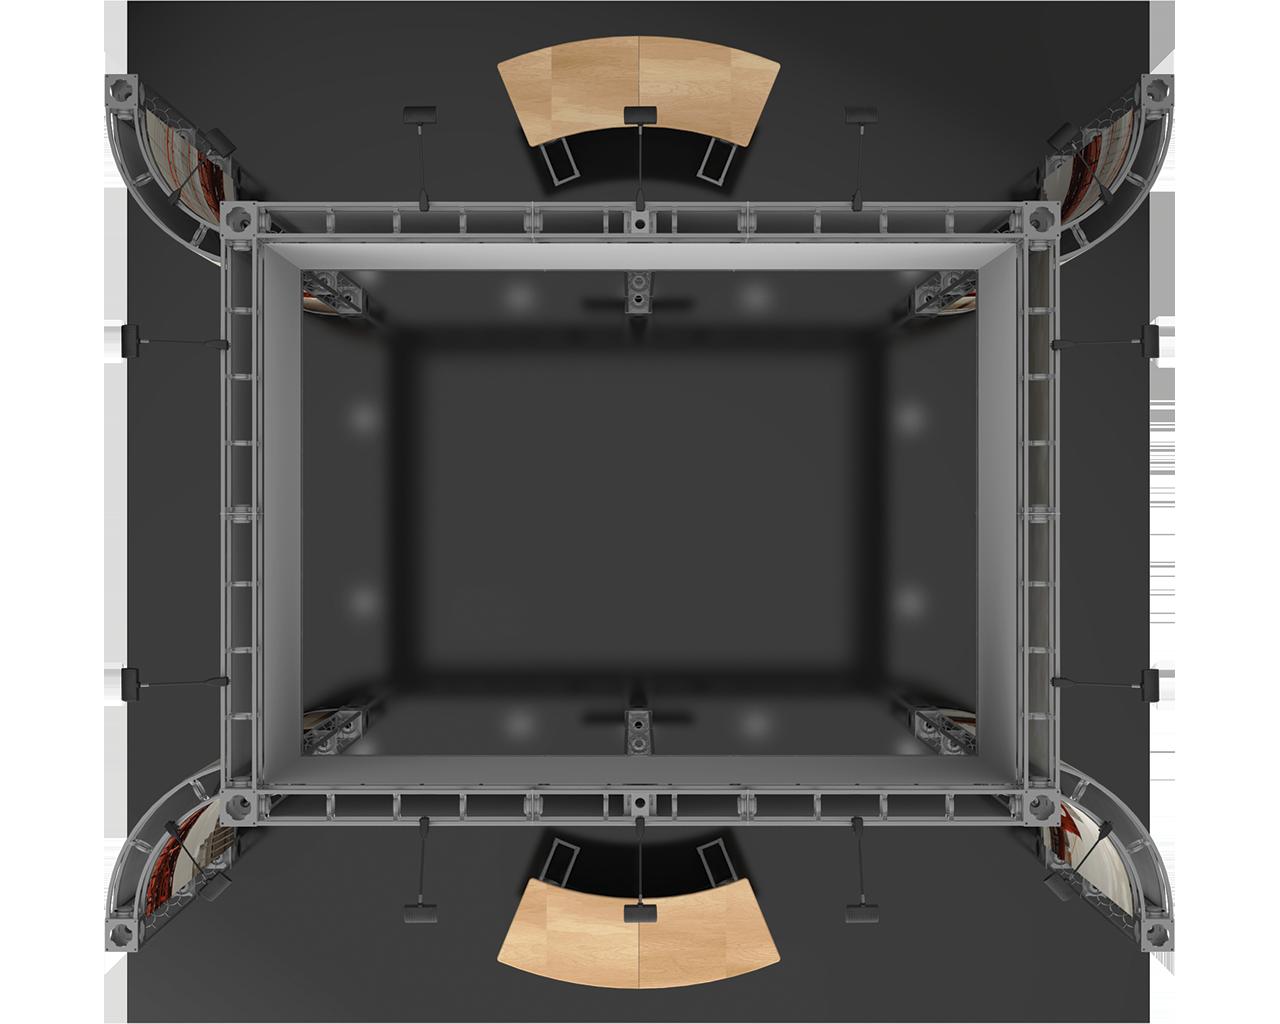 Aarhus 20 x 20 Orbital Truss Display